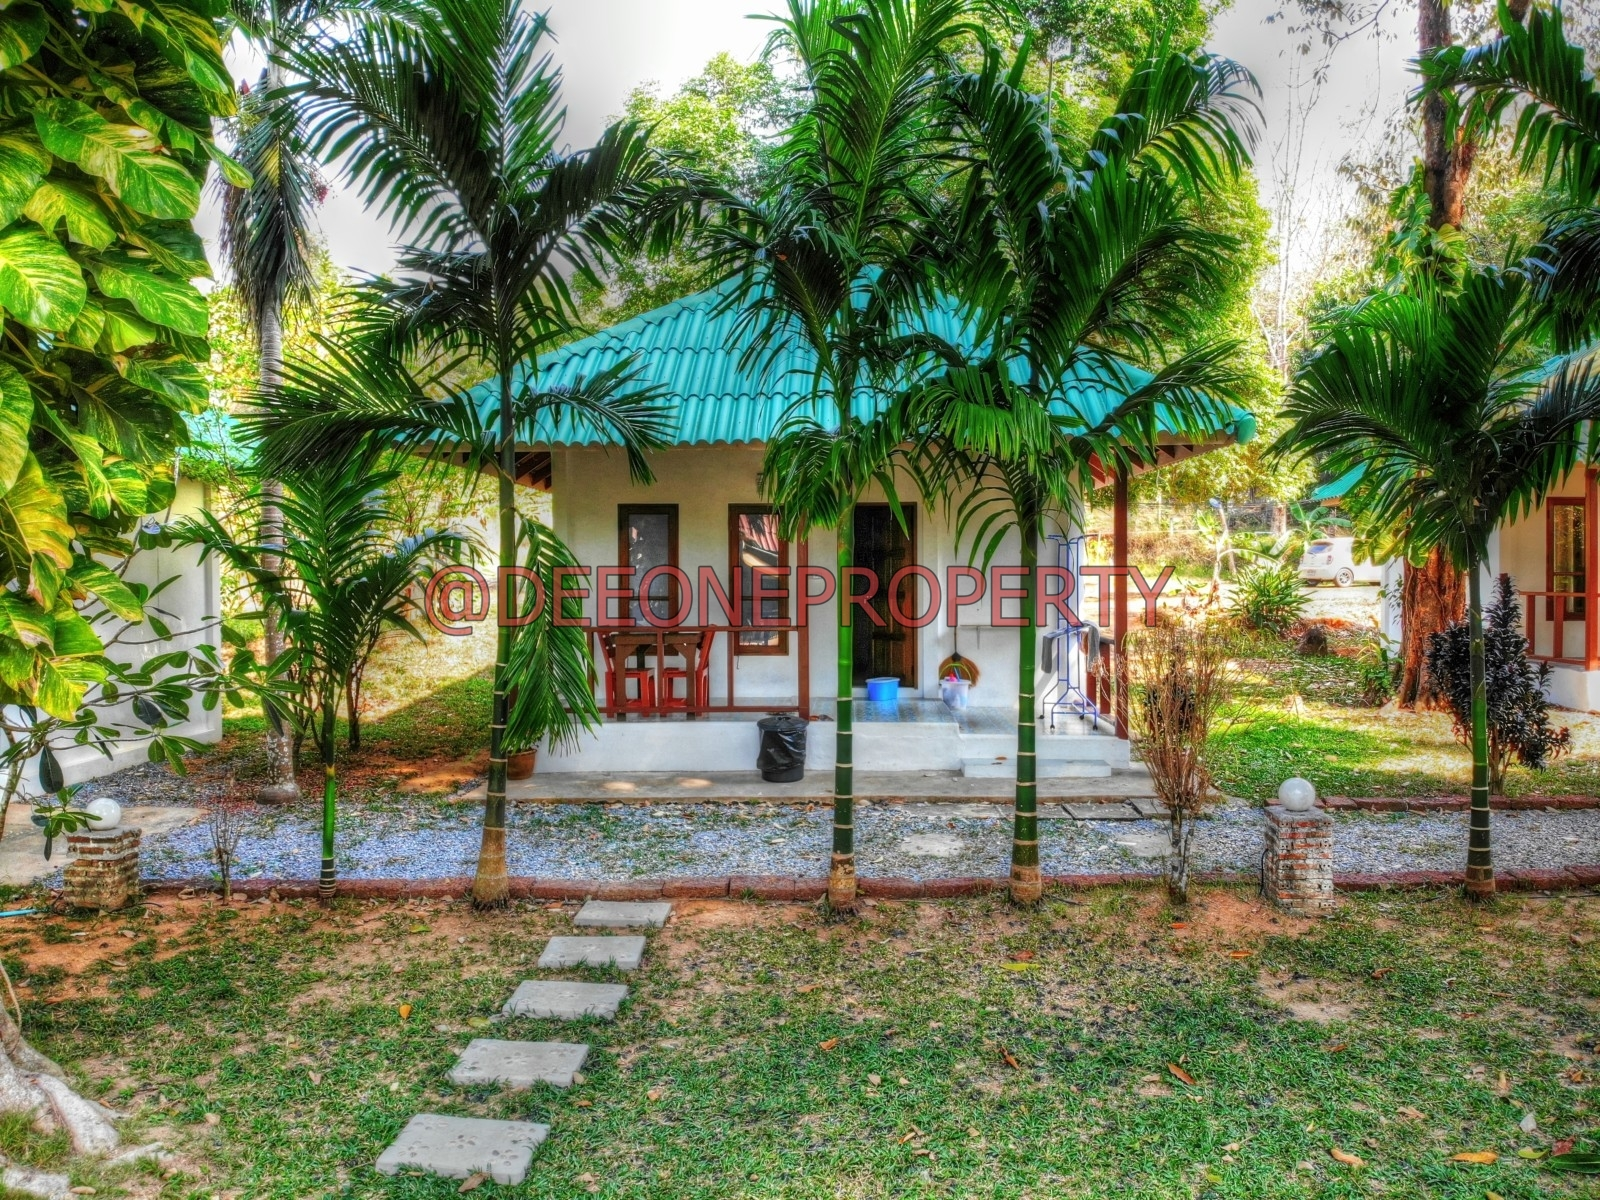 Garden Resort for Sale for BITCOIN in Klong Prao, West Coast